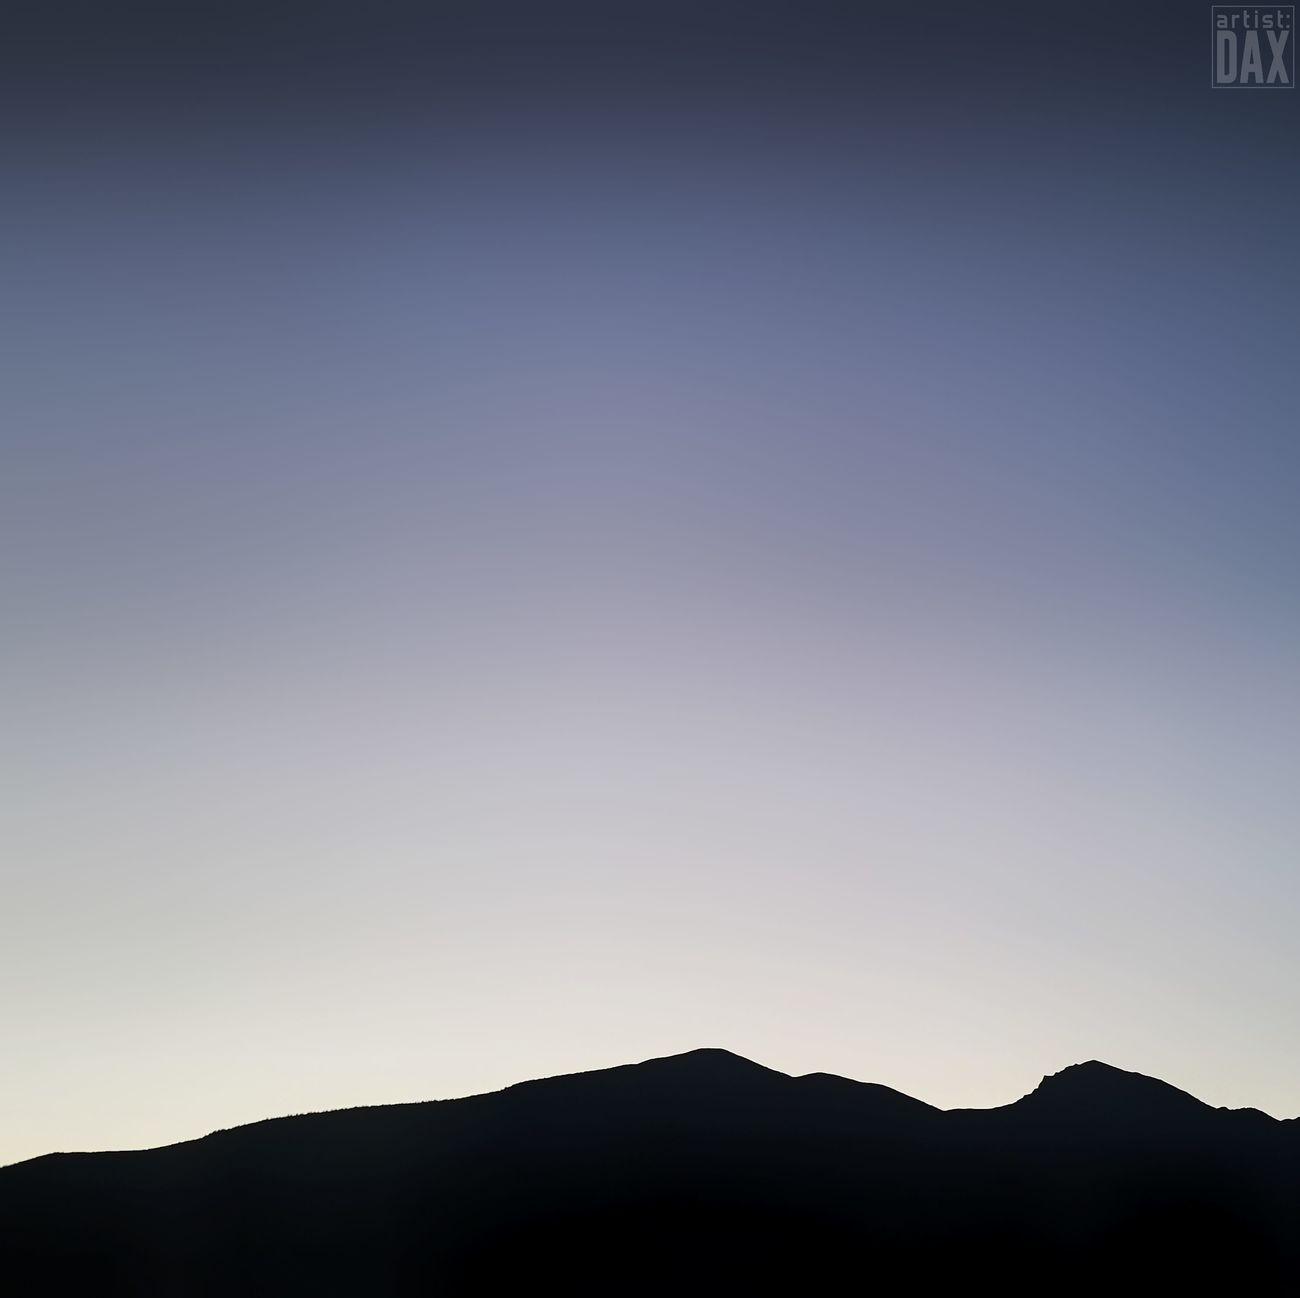 Jasper mountain morning II artist:DAX PHOTOGRAPHOHOLIC I born to capture | Silhouette No People Scenics Sky Nature Outdoors Beauty In Nature Day Sunrise Dusky Sky Dusk Colours Mountain Silhouette EyeEm Gallery ArtistDAX Clearskys Minimalmood Minimal Minimallandscape Canada Alberta Jasper National Park❤️ Jasper Alberta Canada Blue Hour